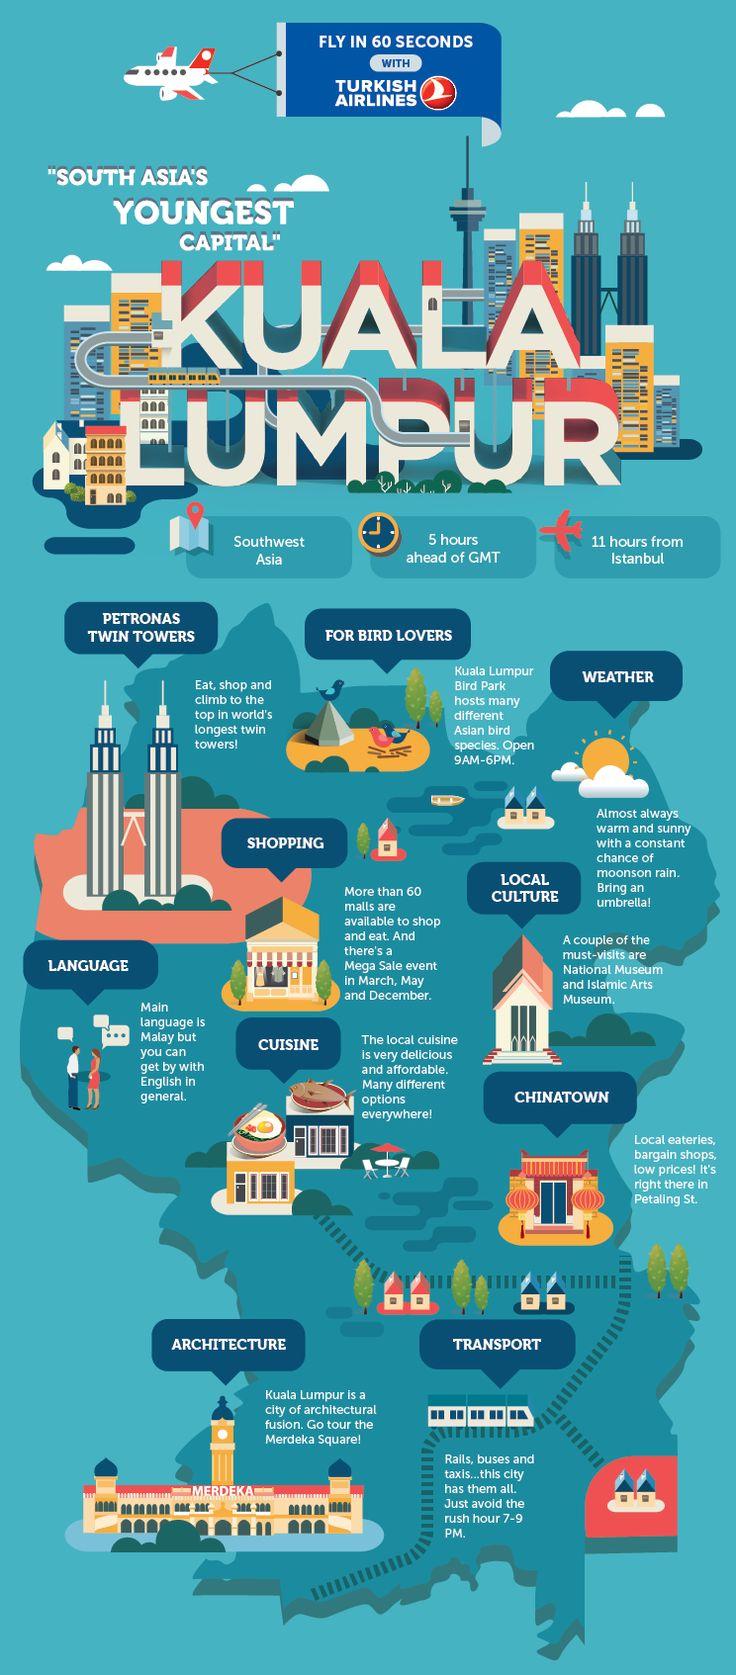 Turkish Airlines' Kuala Lumpur travel guide by Jing Zhang